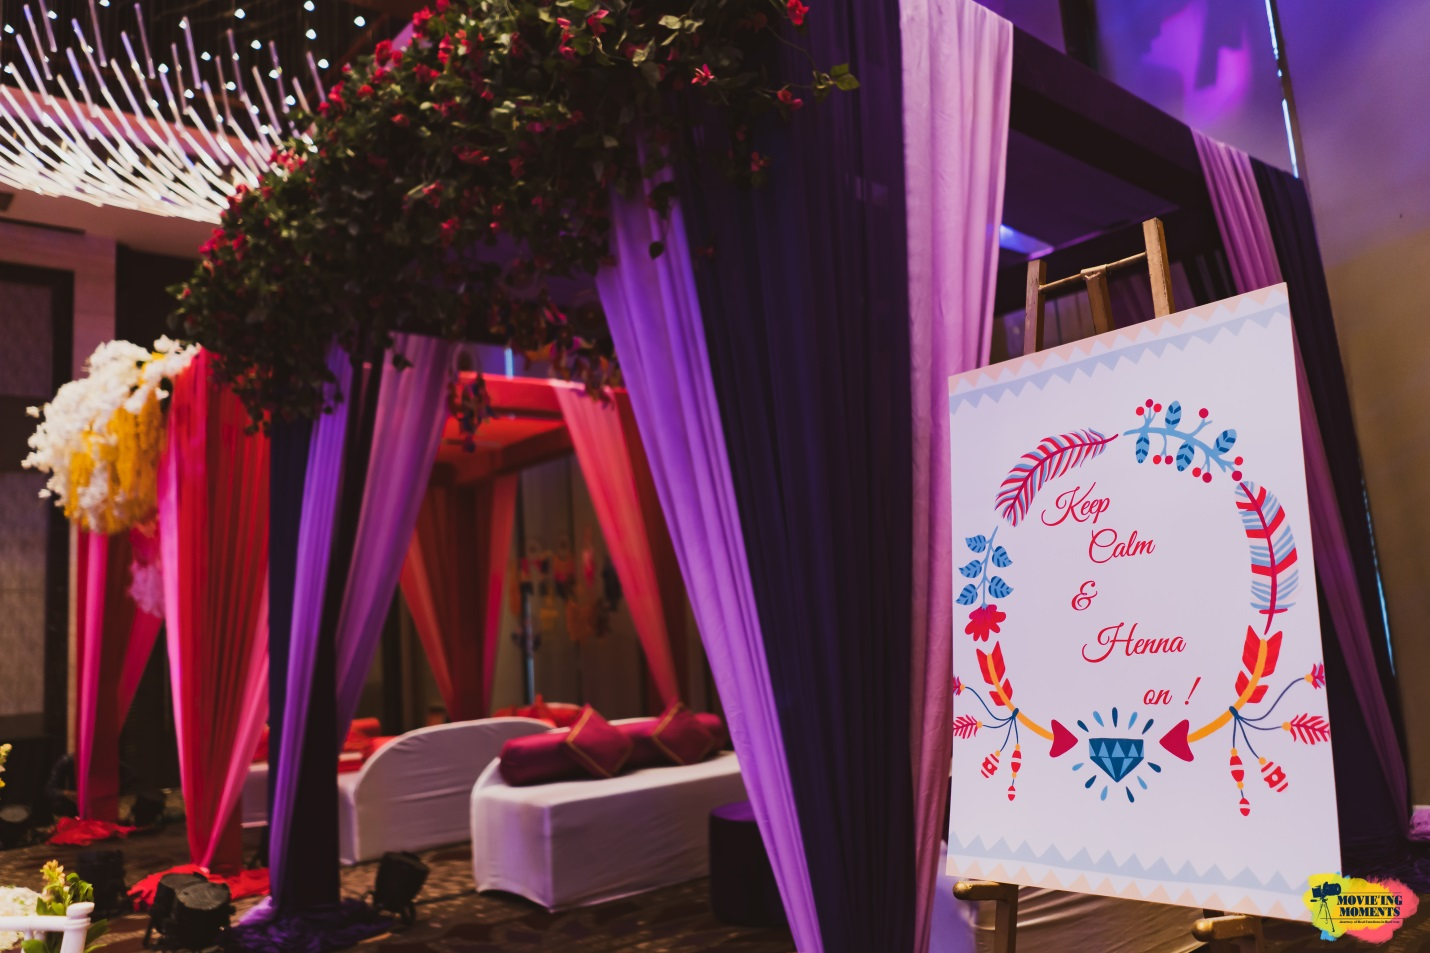 Indoor garden themed wedding decor